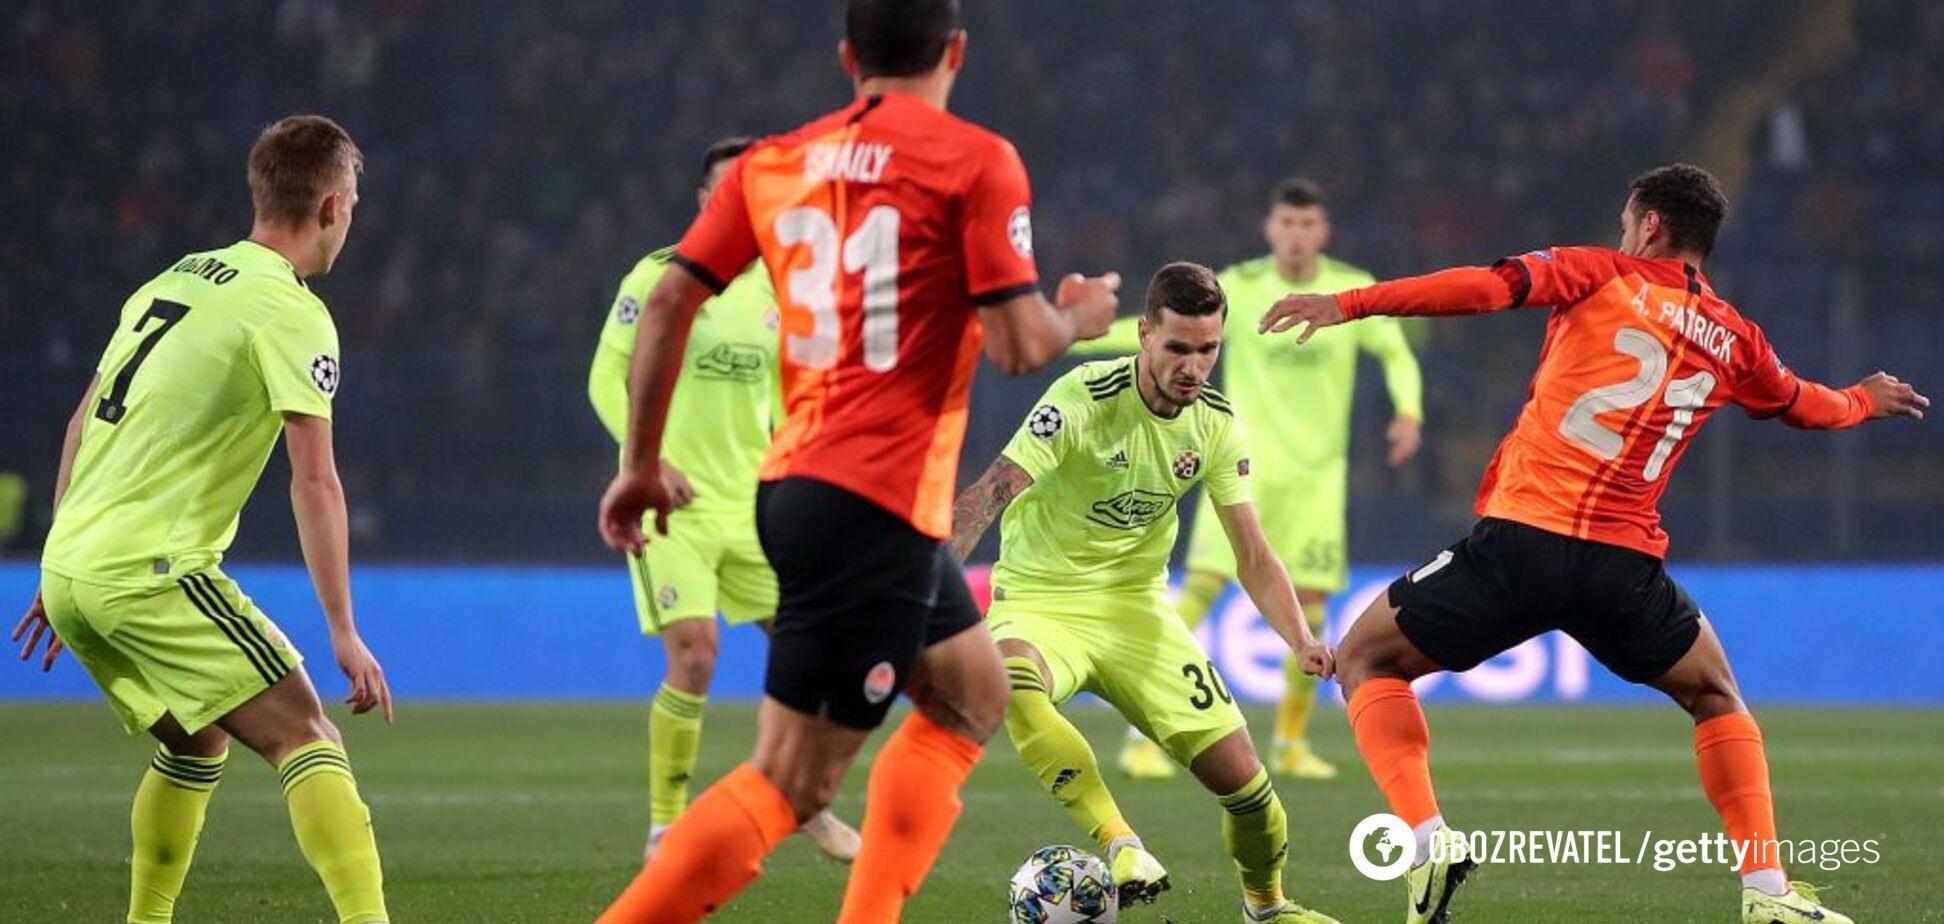 'Шахтер' - 'Динамо' Загреб: видеообзор матча Лиги чемпионов